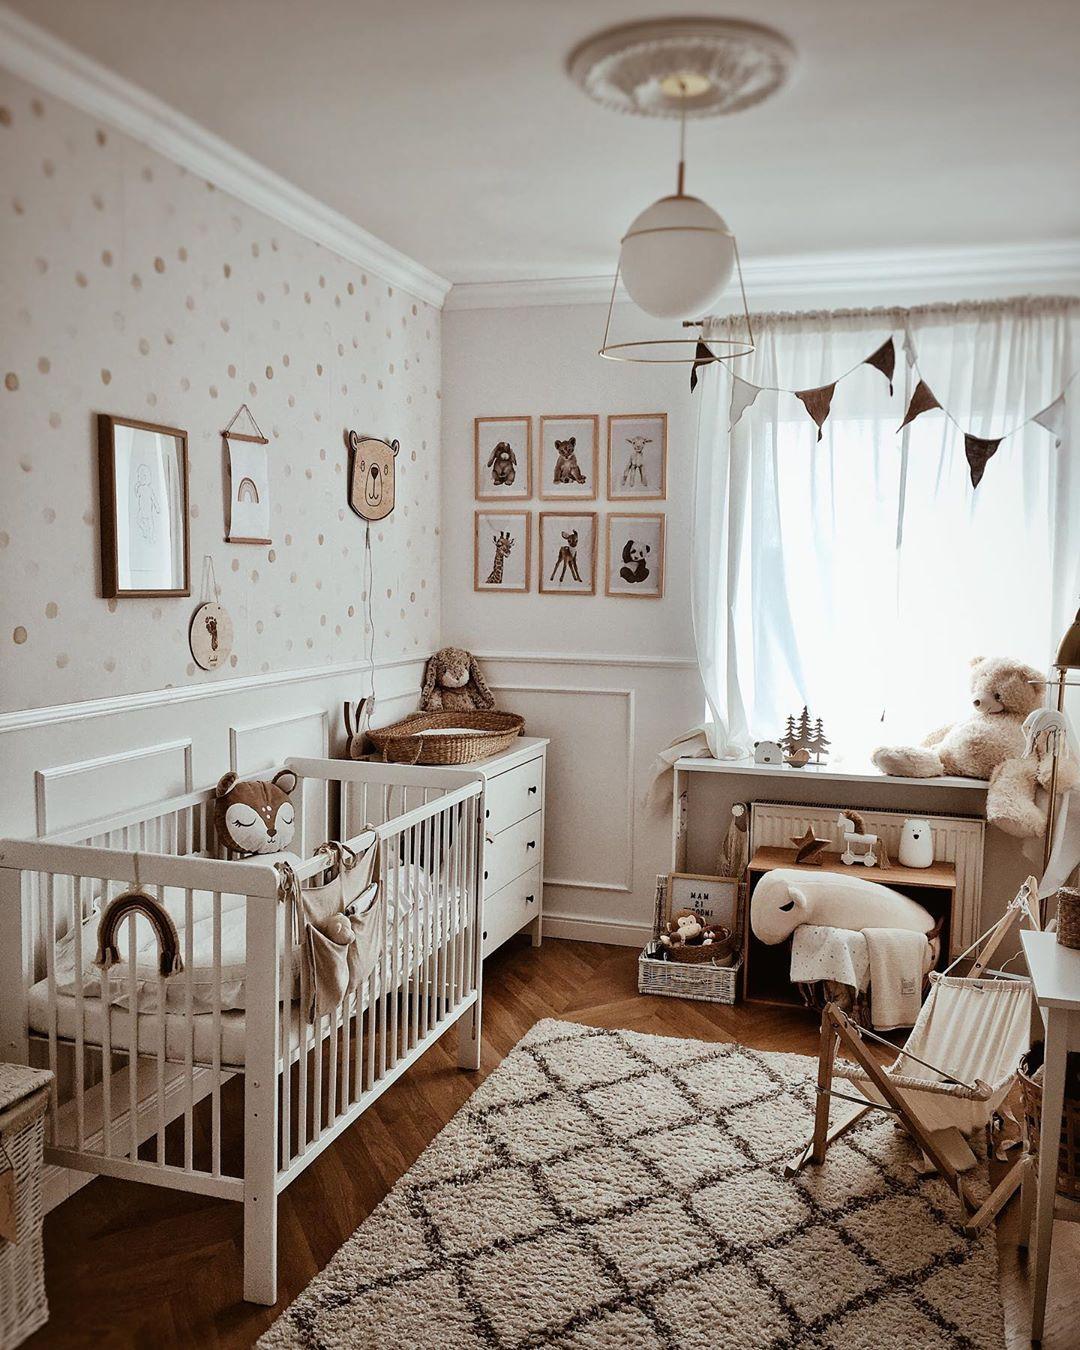 Charming Baby Nursery Room Decor Ideas From Instagram